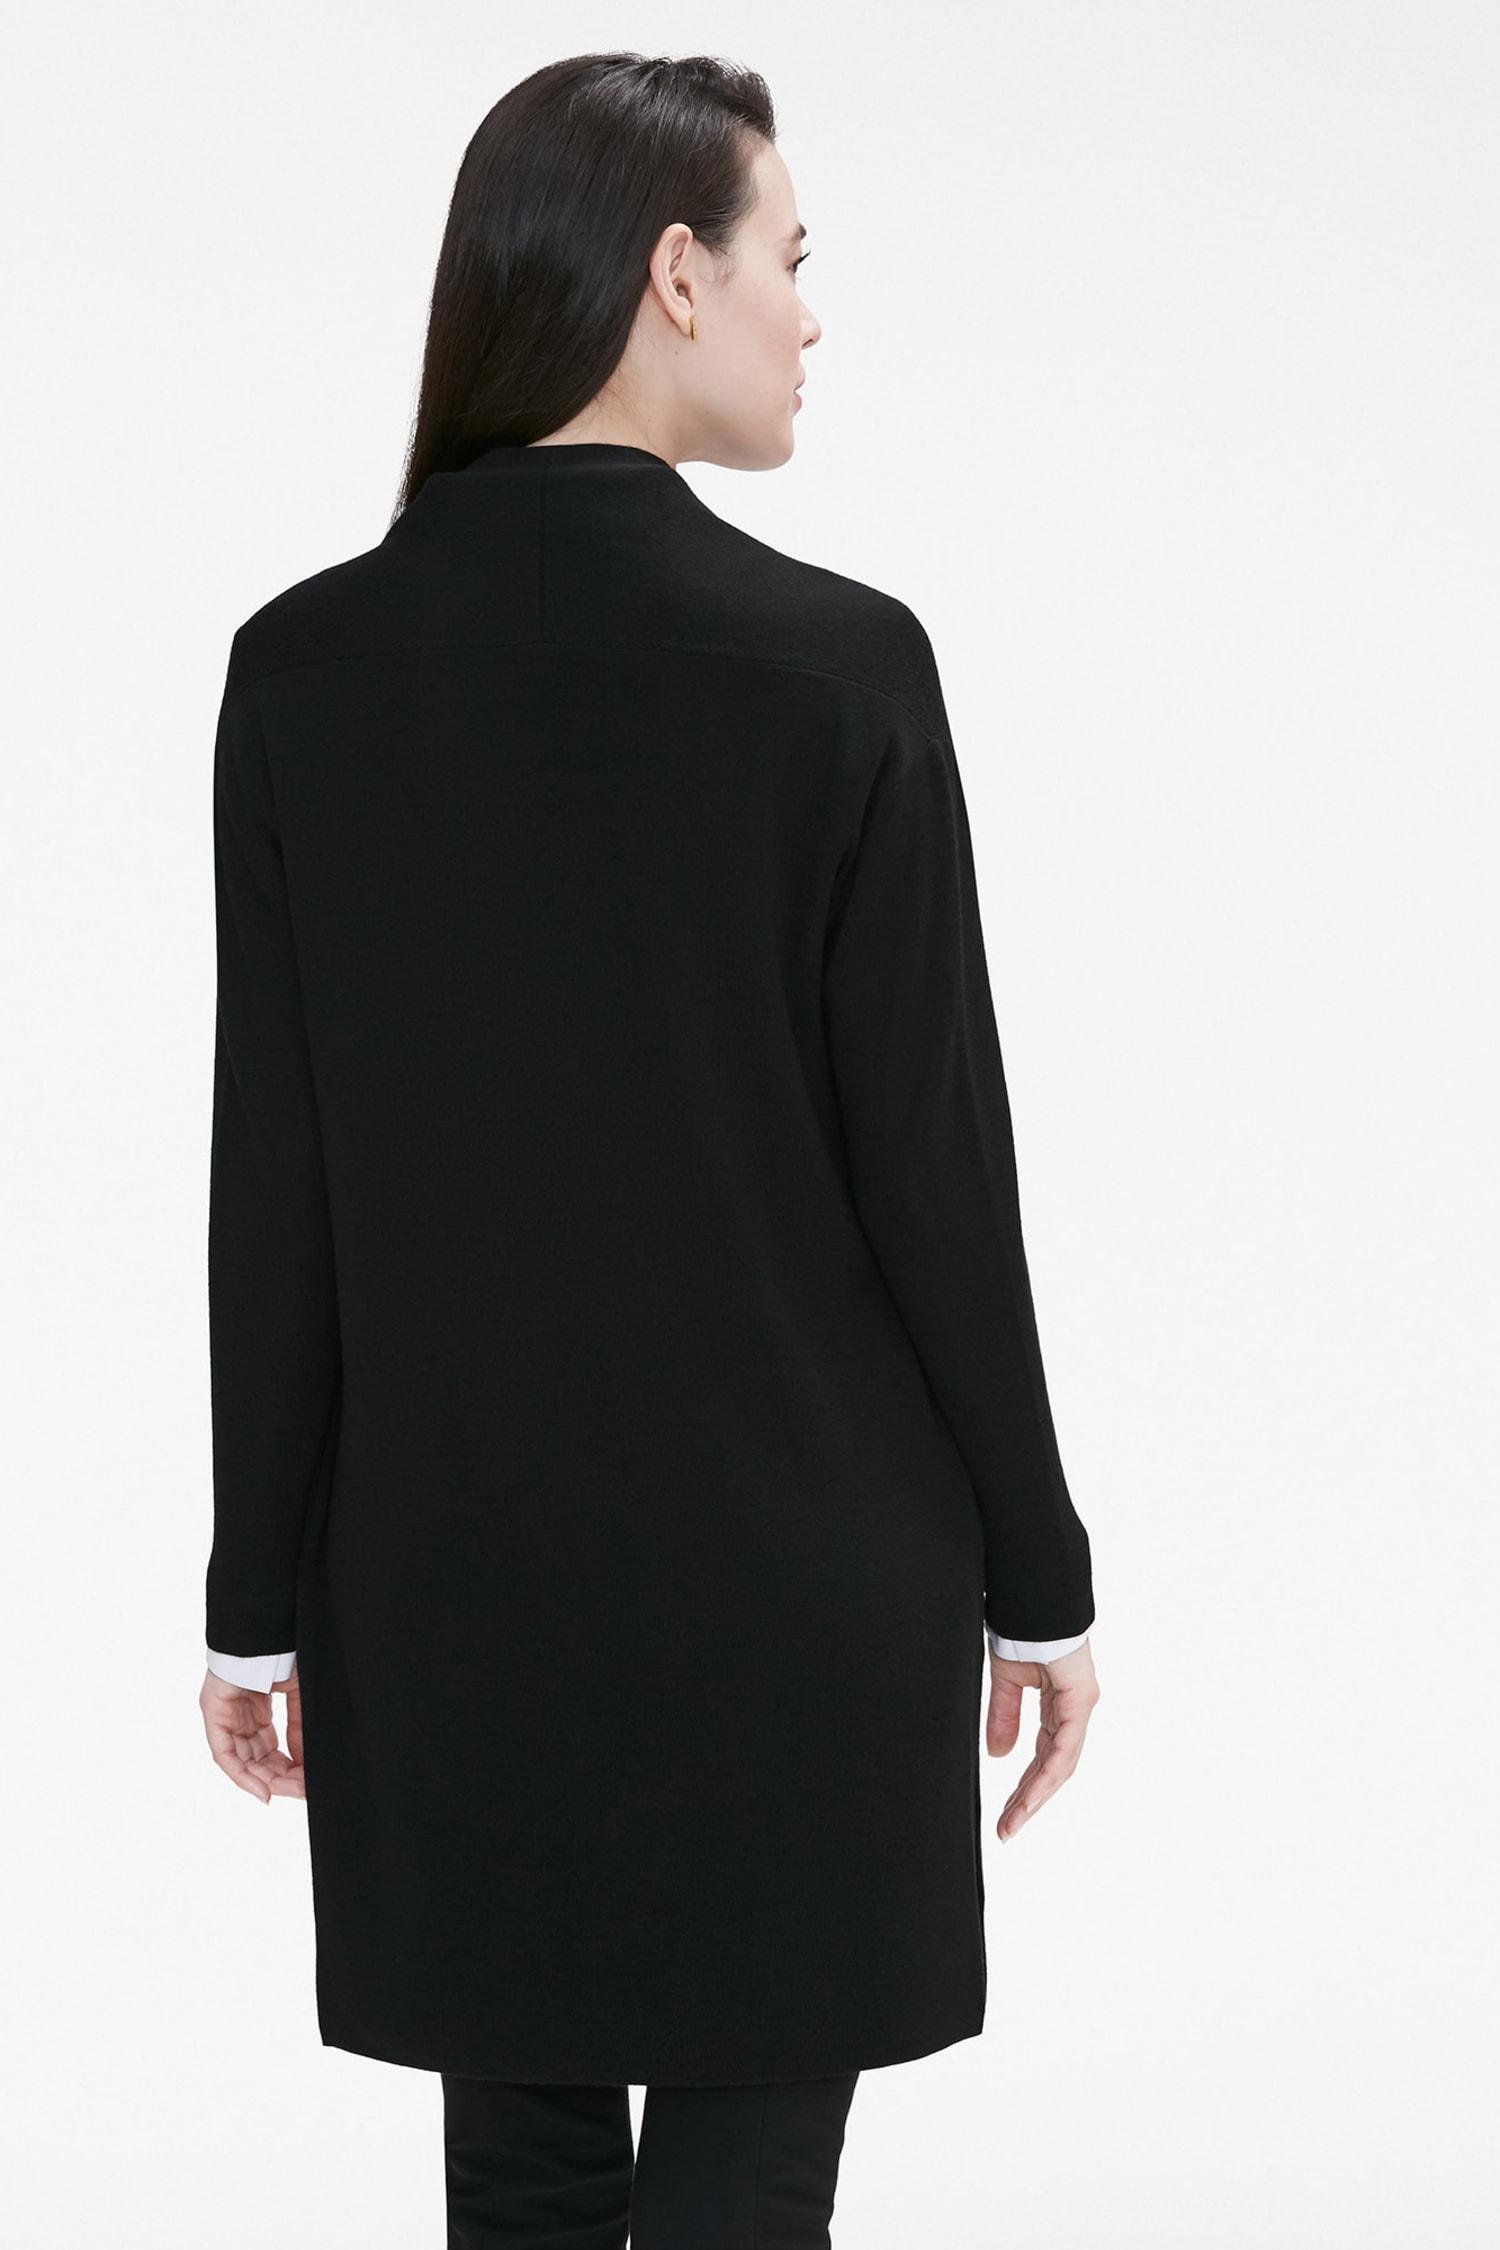 146889cbdd2001 Ono 2.0 Cardigan - Black | MM.LaFleur